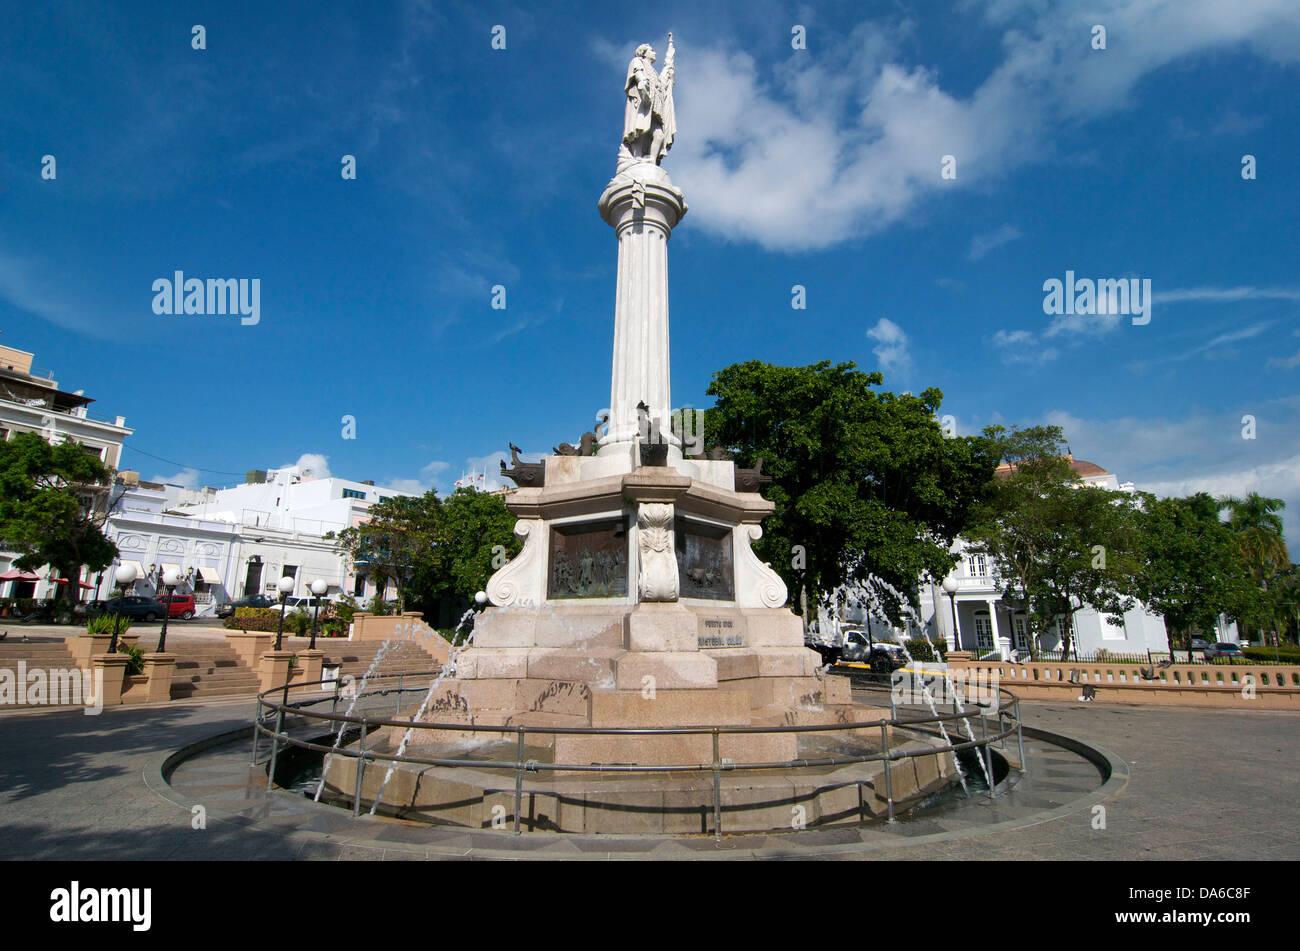 Puerto Rico, Caribbean, Greater Antilles, Antilles, Columbus, Columbus, statue, statues, sculpture, figure, figures, - Stock Image